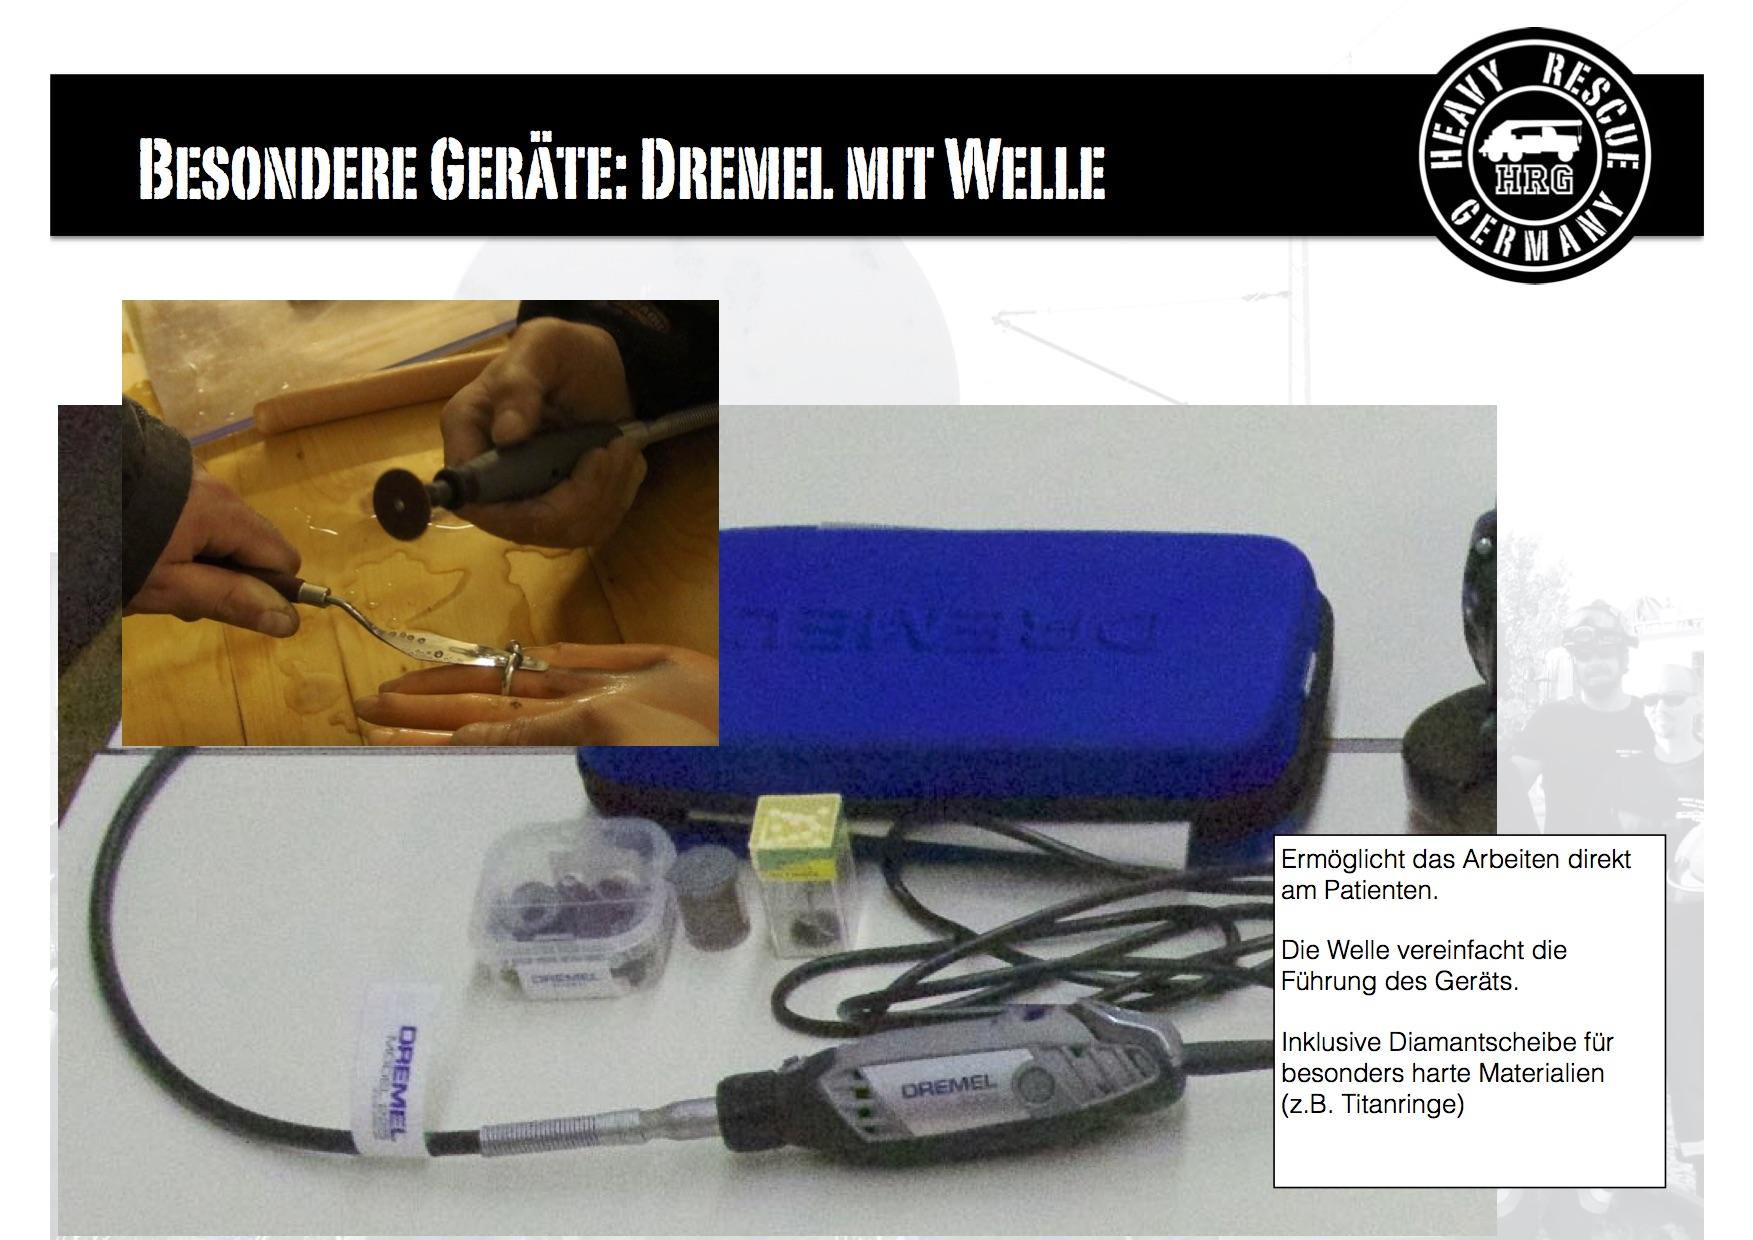 neu werkzeugsatz maschinenunfall bastian feuerwehrtechnik. Black Bedroom Furniture Sets. Home Design Ideas